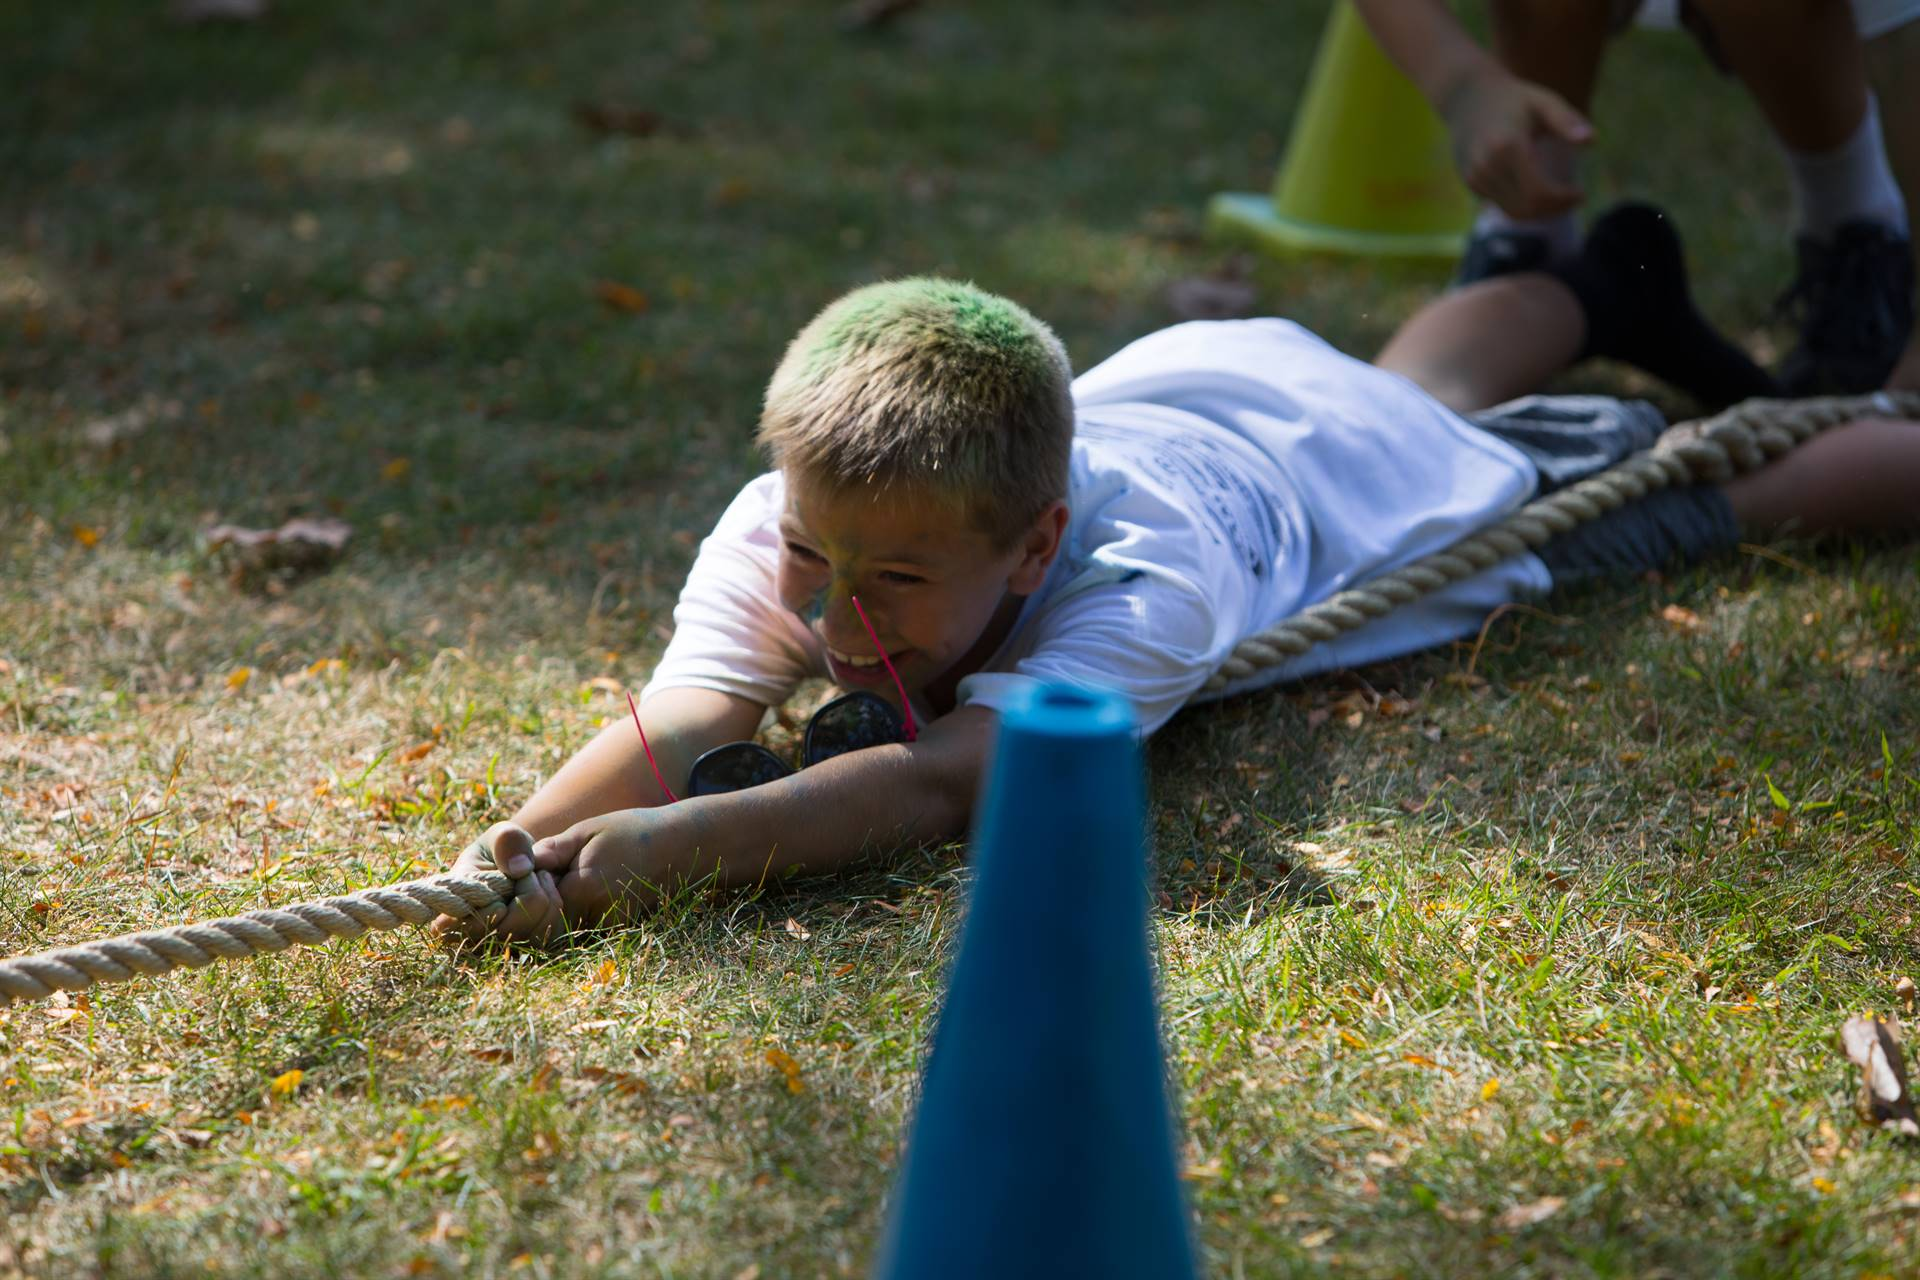 Boy on ground at tug of war